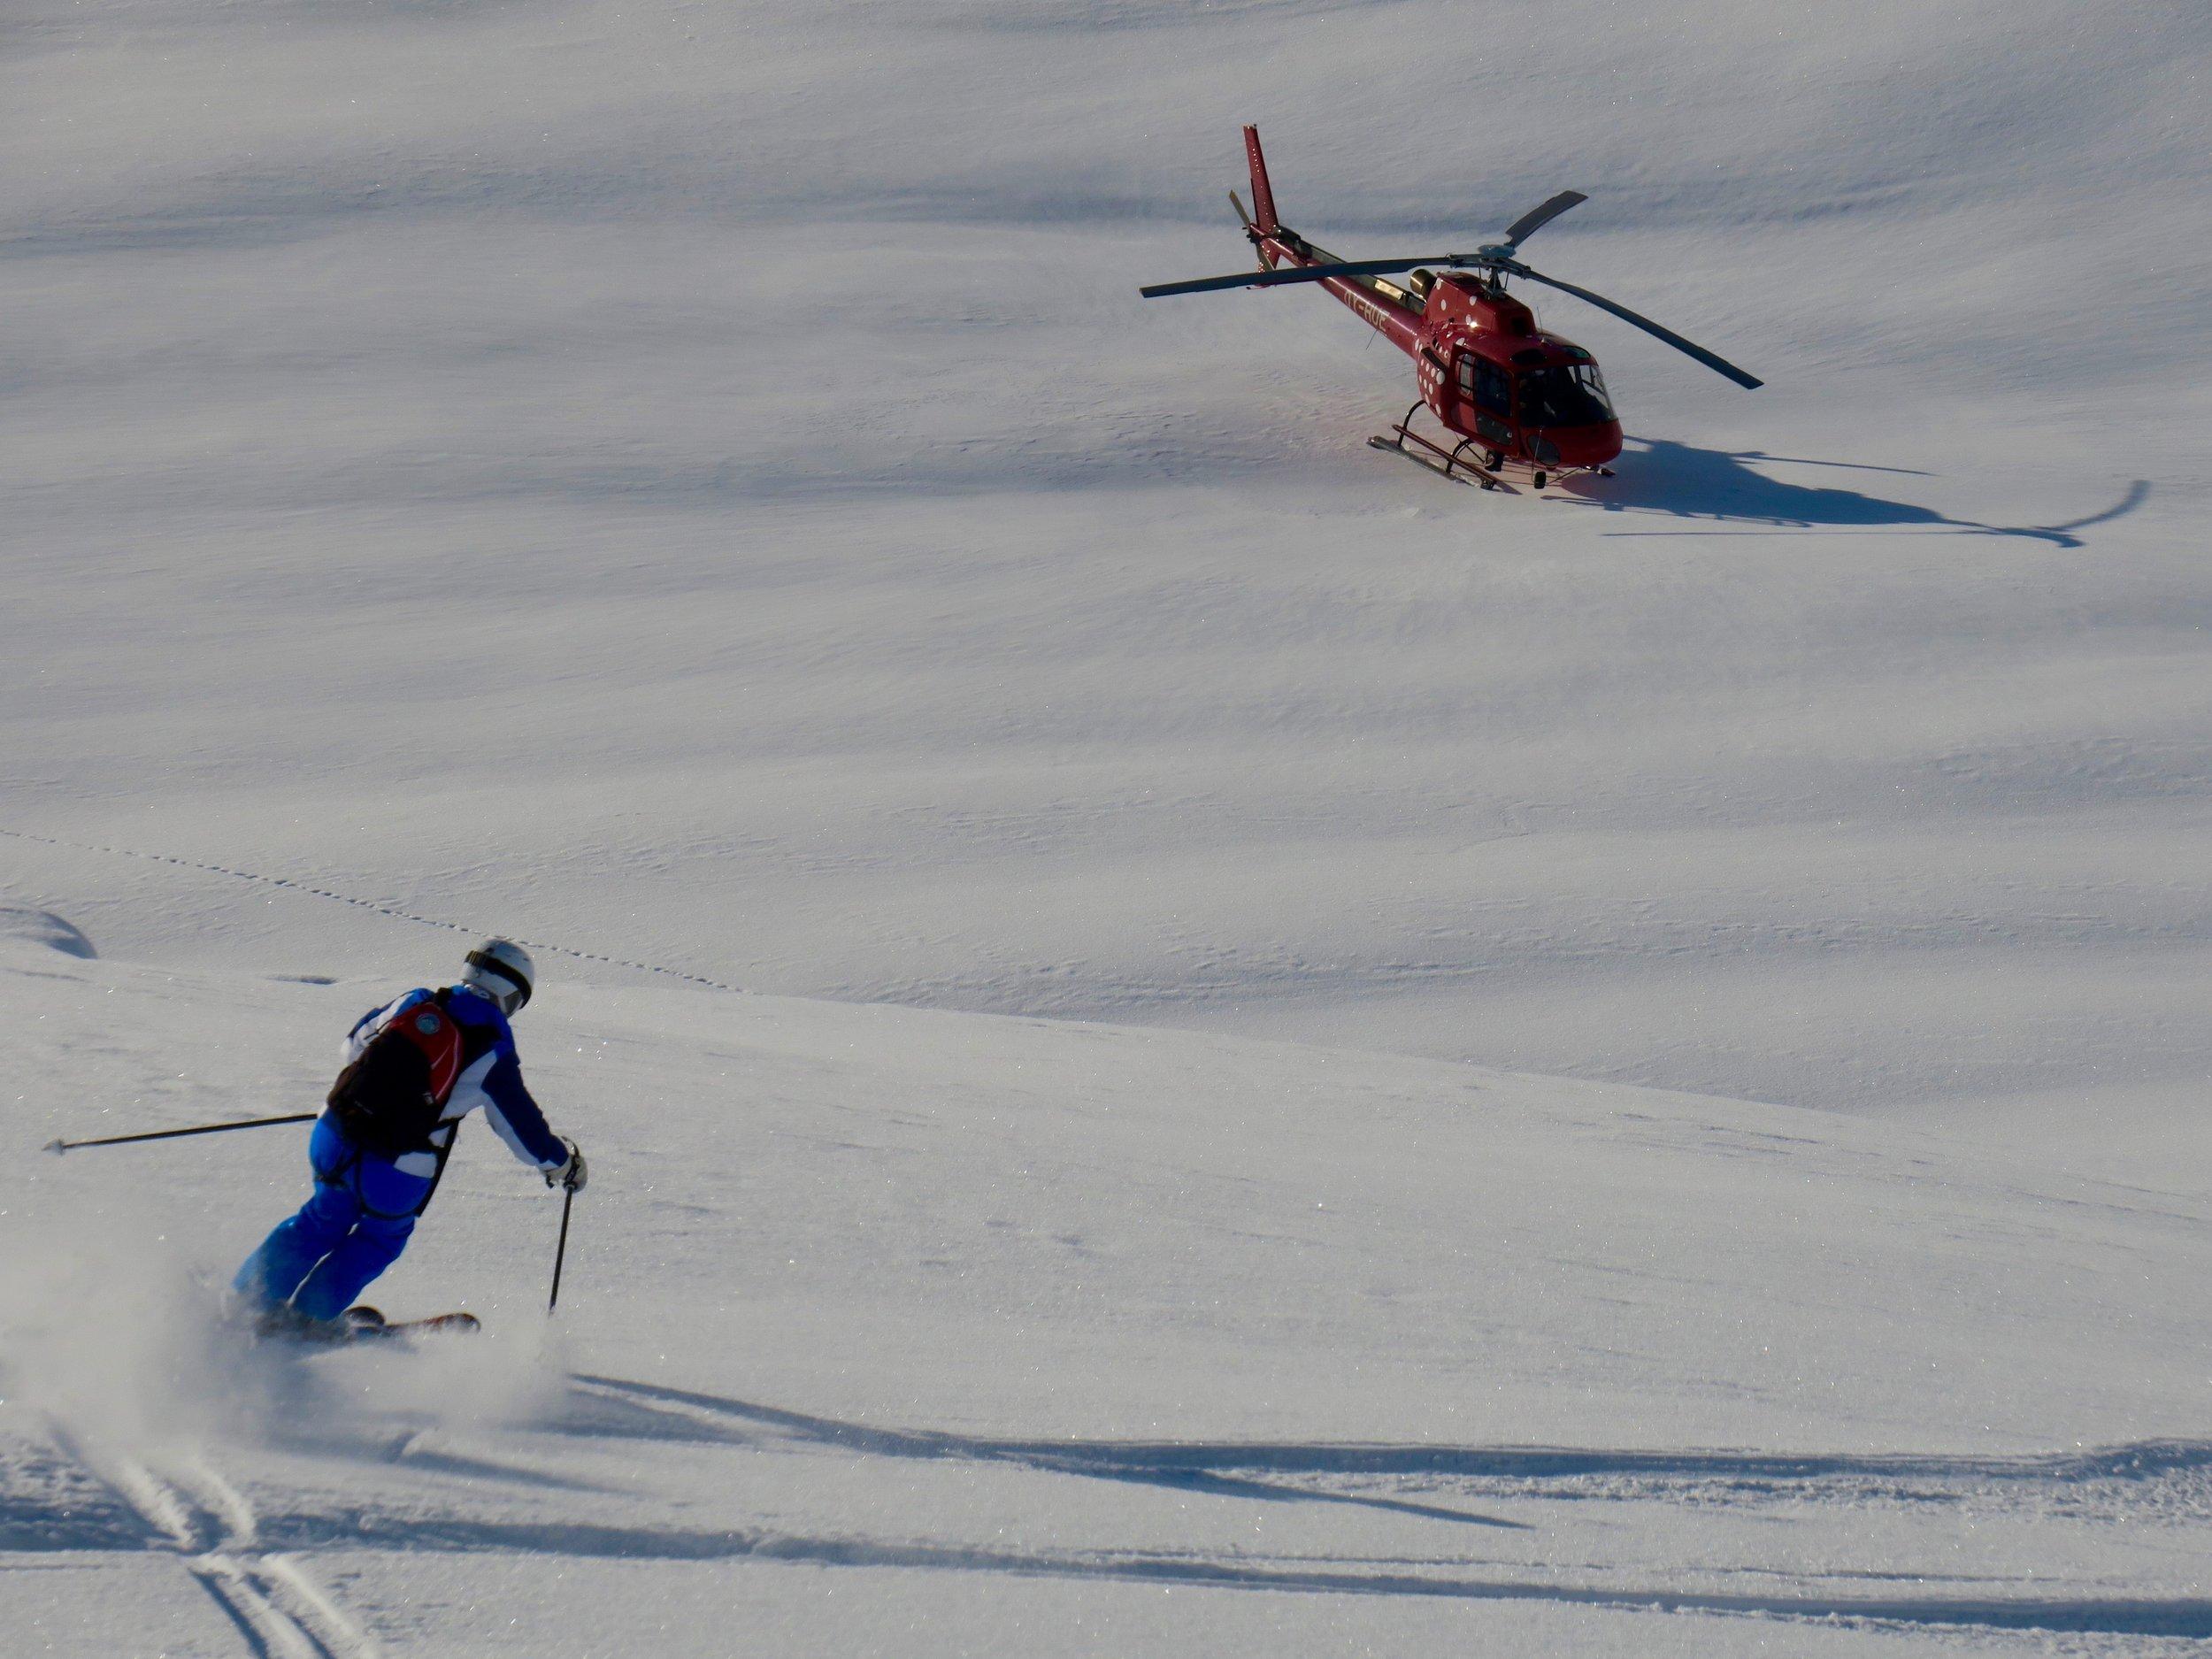 Dreamy heli-skiing turns by Ann.